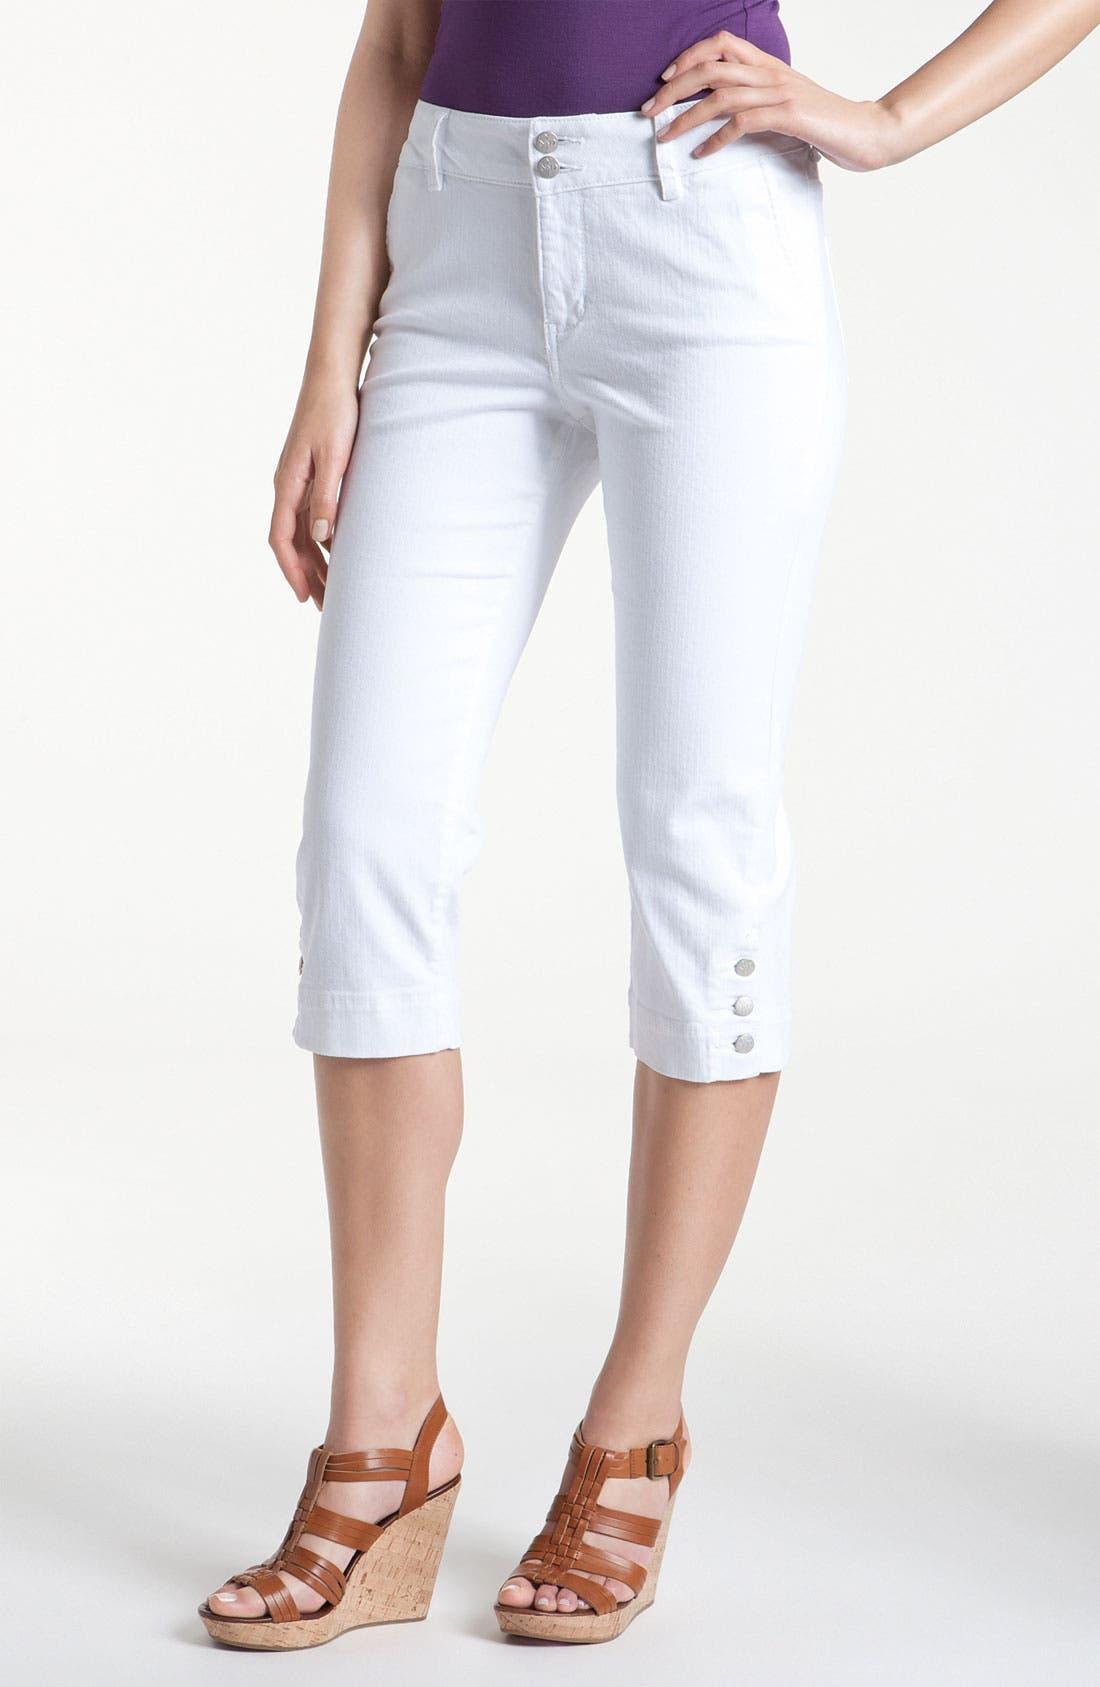 Alternate Image 1 Selected - NYDJ 'Cameron' Crop Stretch Jeans